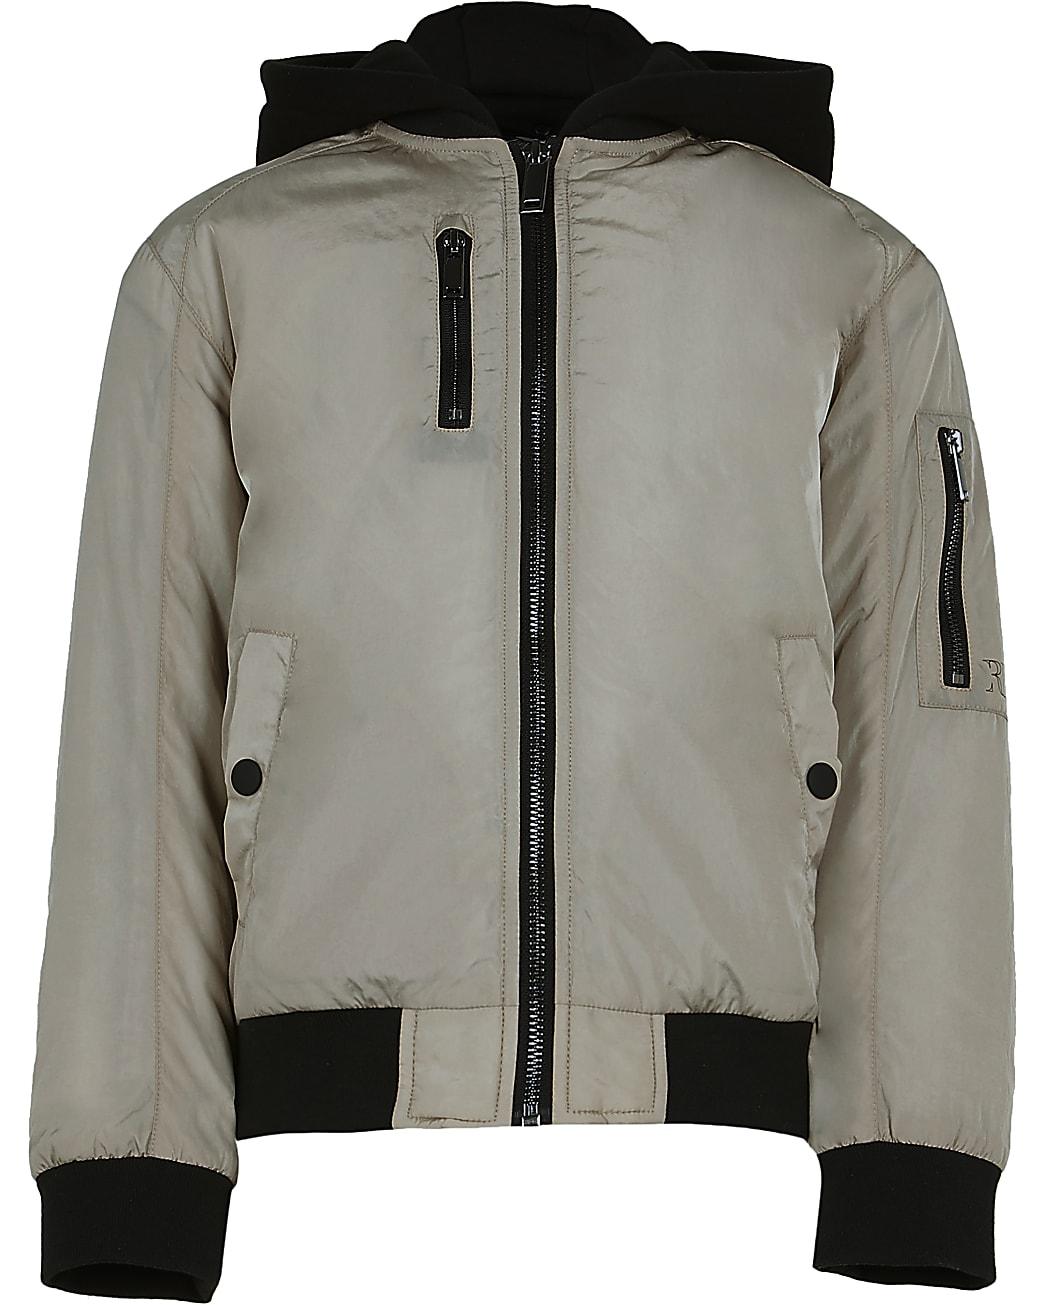 Boys beige hooded utility bomber jacket